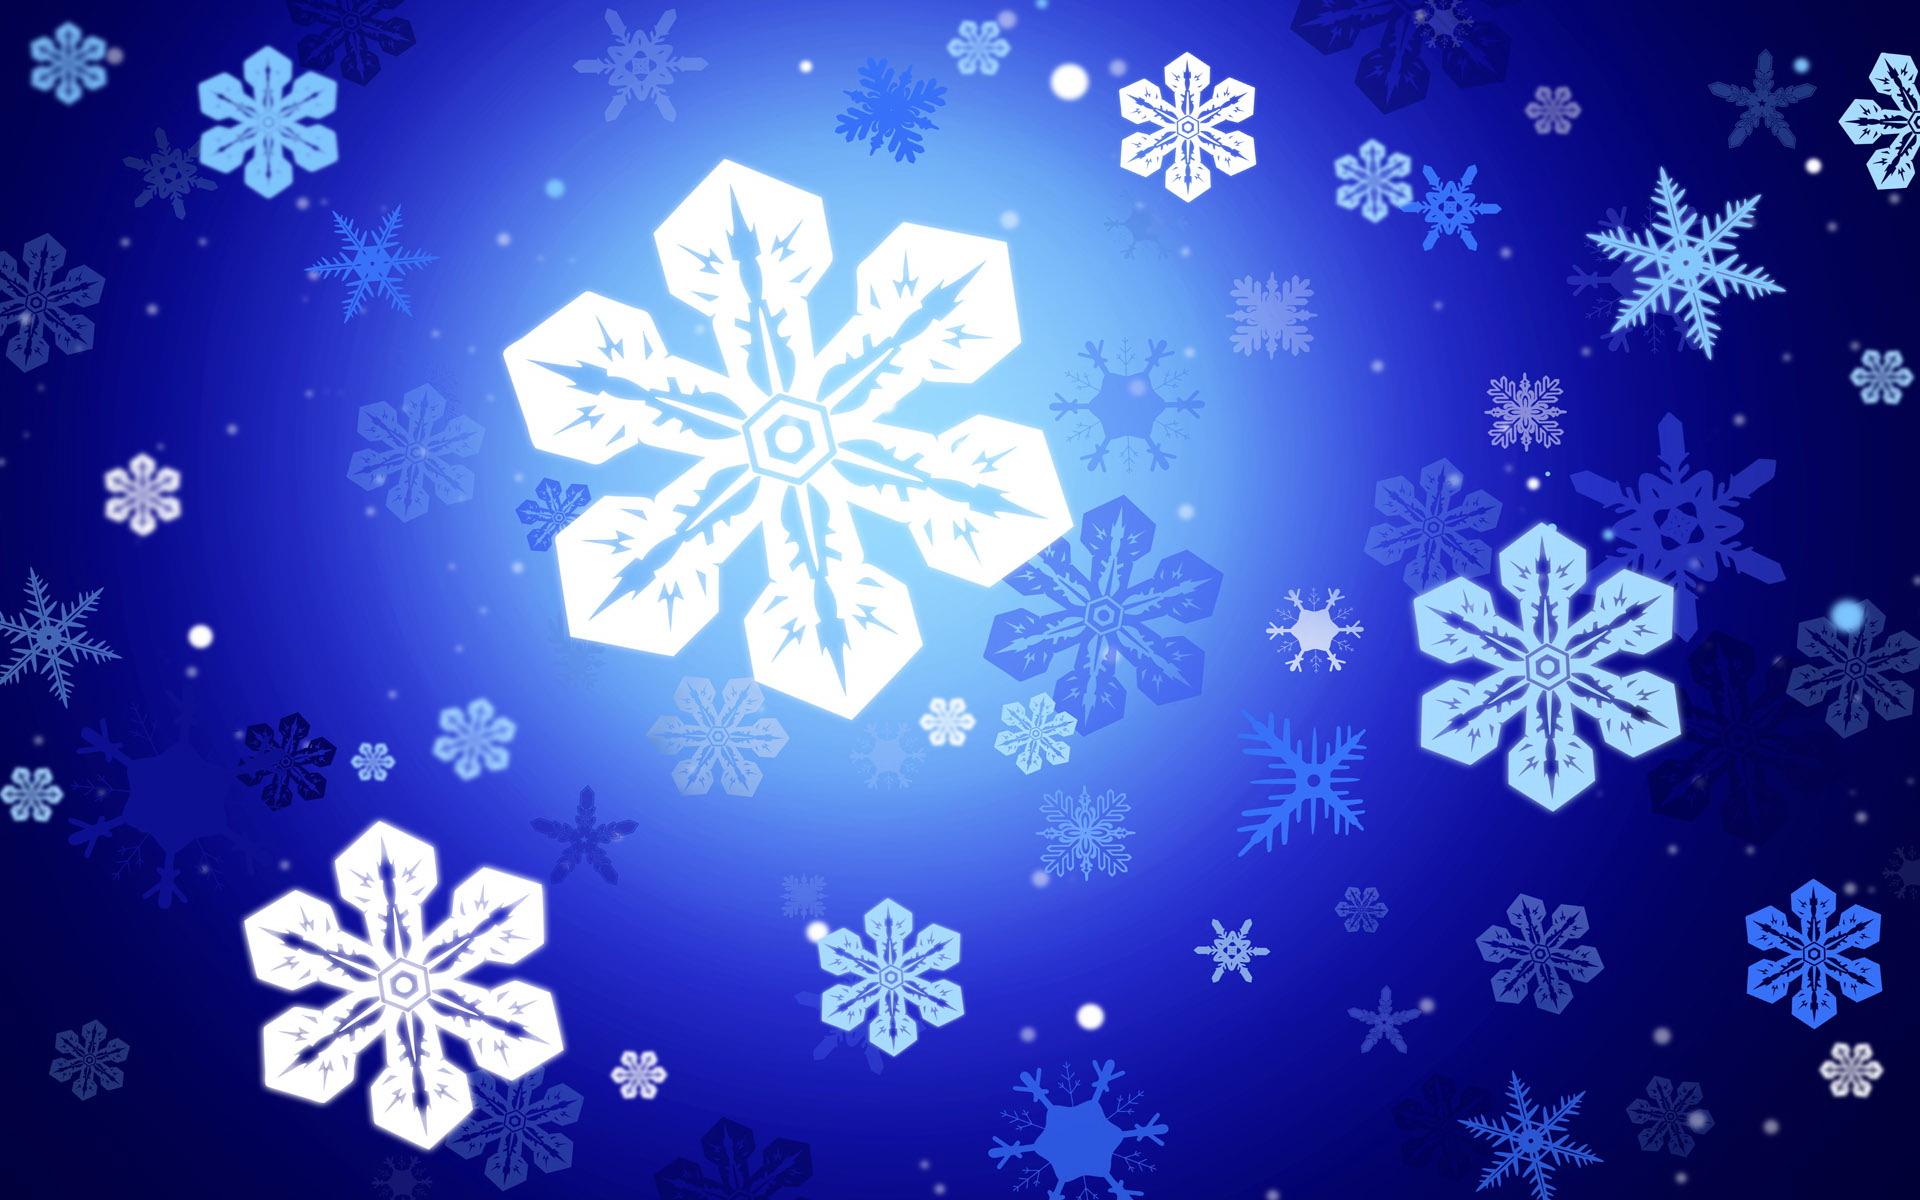 Snowflake wallpaper for desktop wallpapersafari snowflakes wallpapers desktop wallpapers voltagebd Choice Image